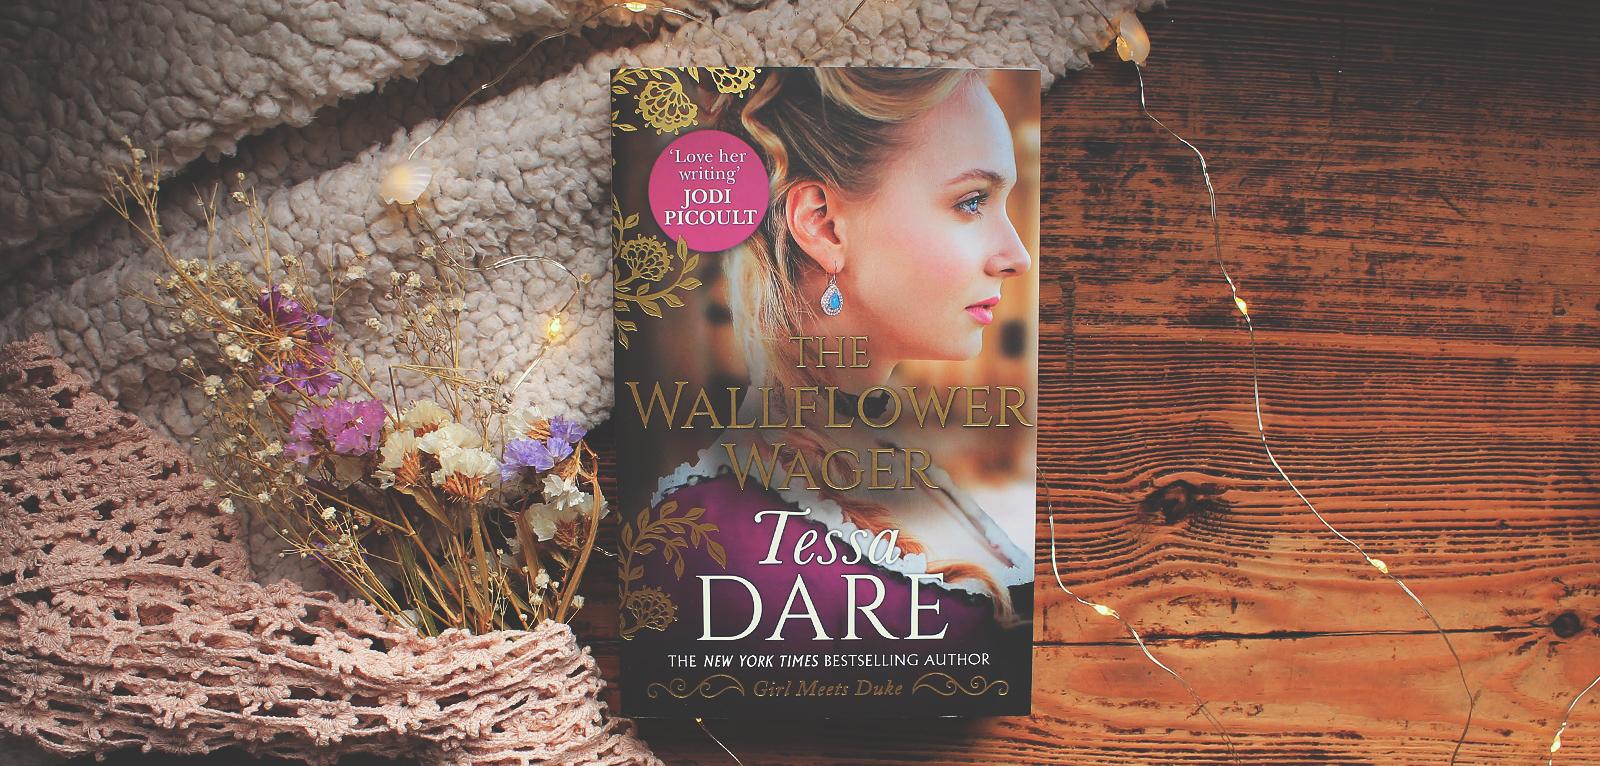 The Wallflower Wager · Tessa Dare